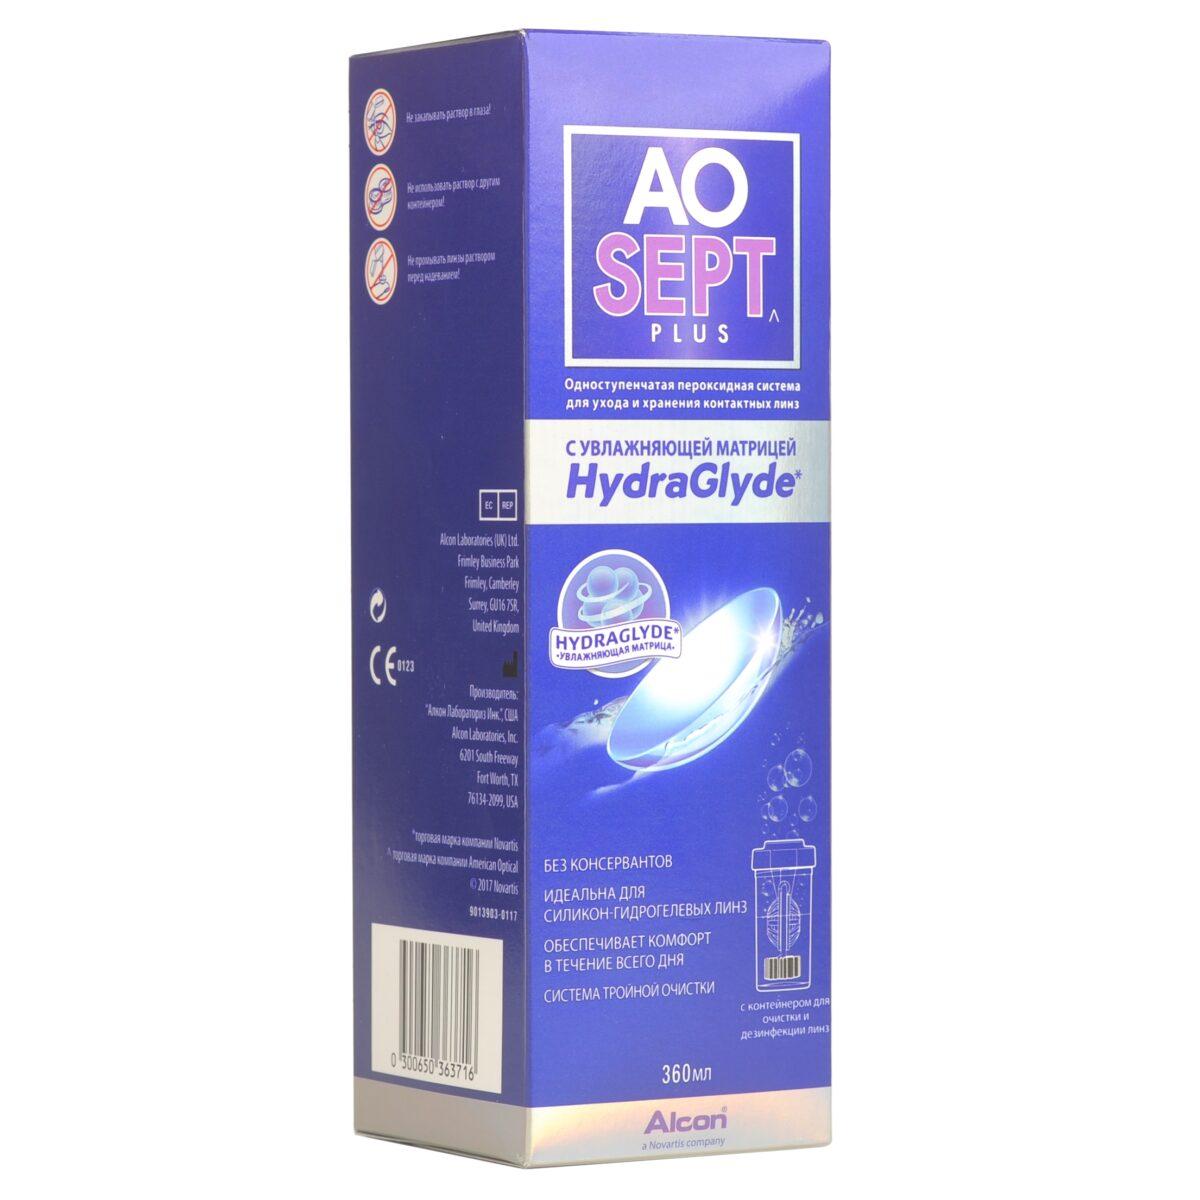 Раствор AOSept HydraGlyde Plus 360 мл.